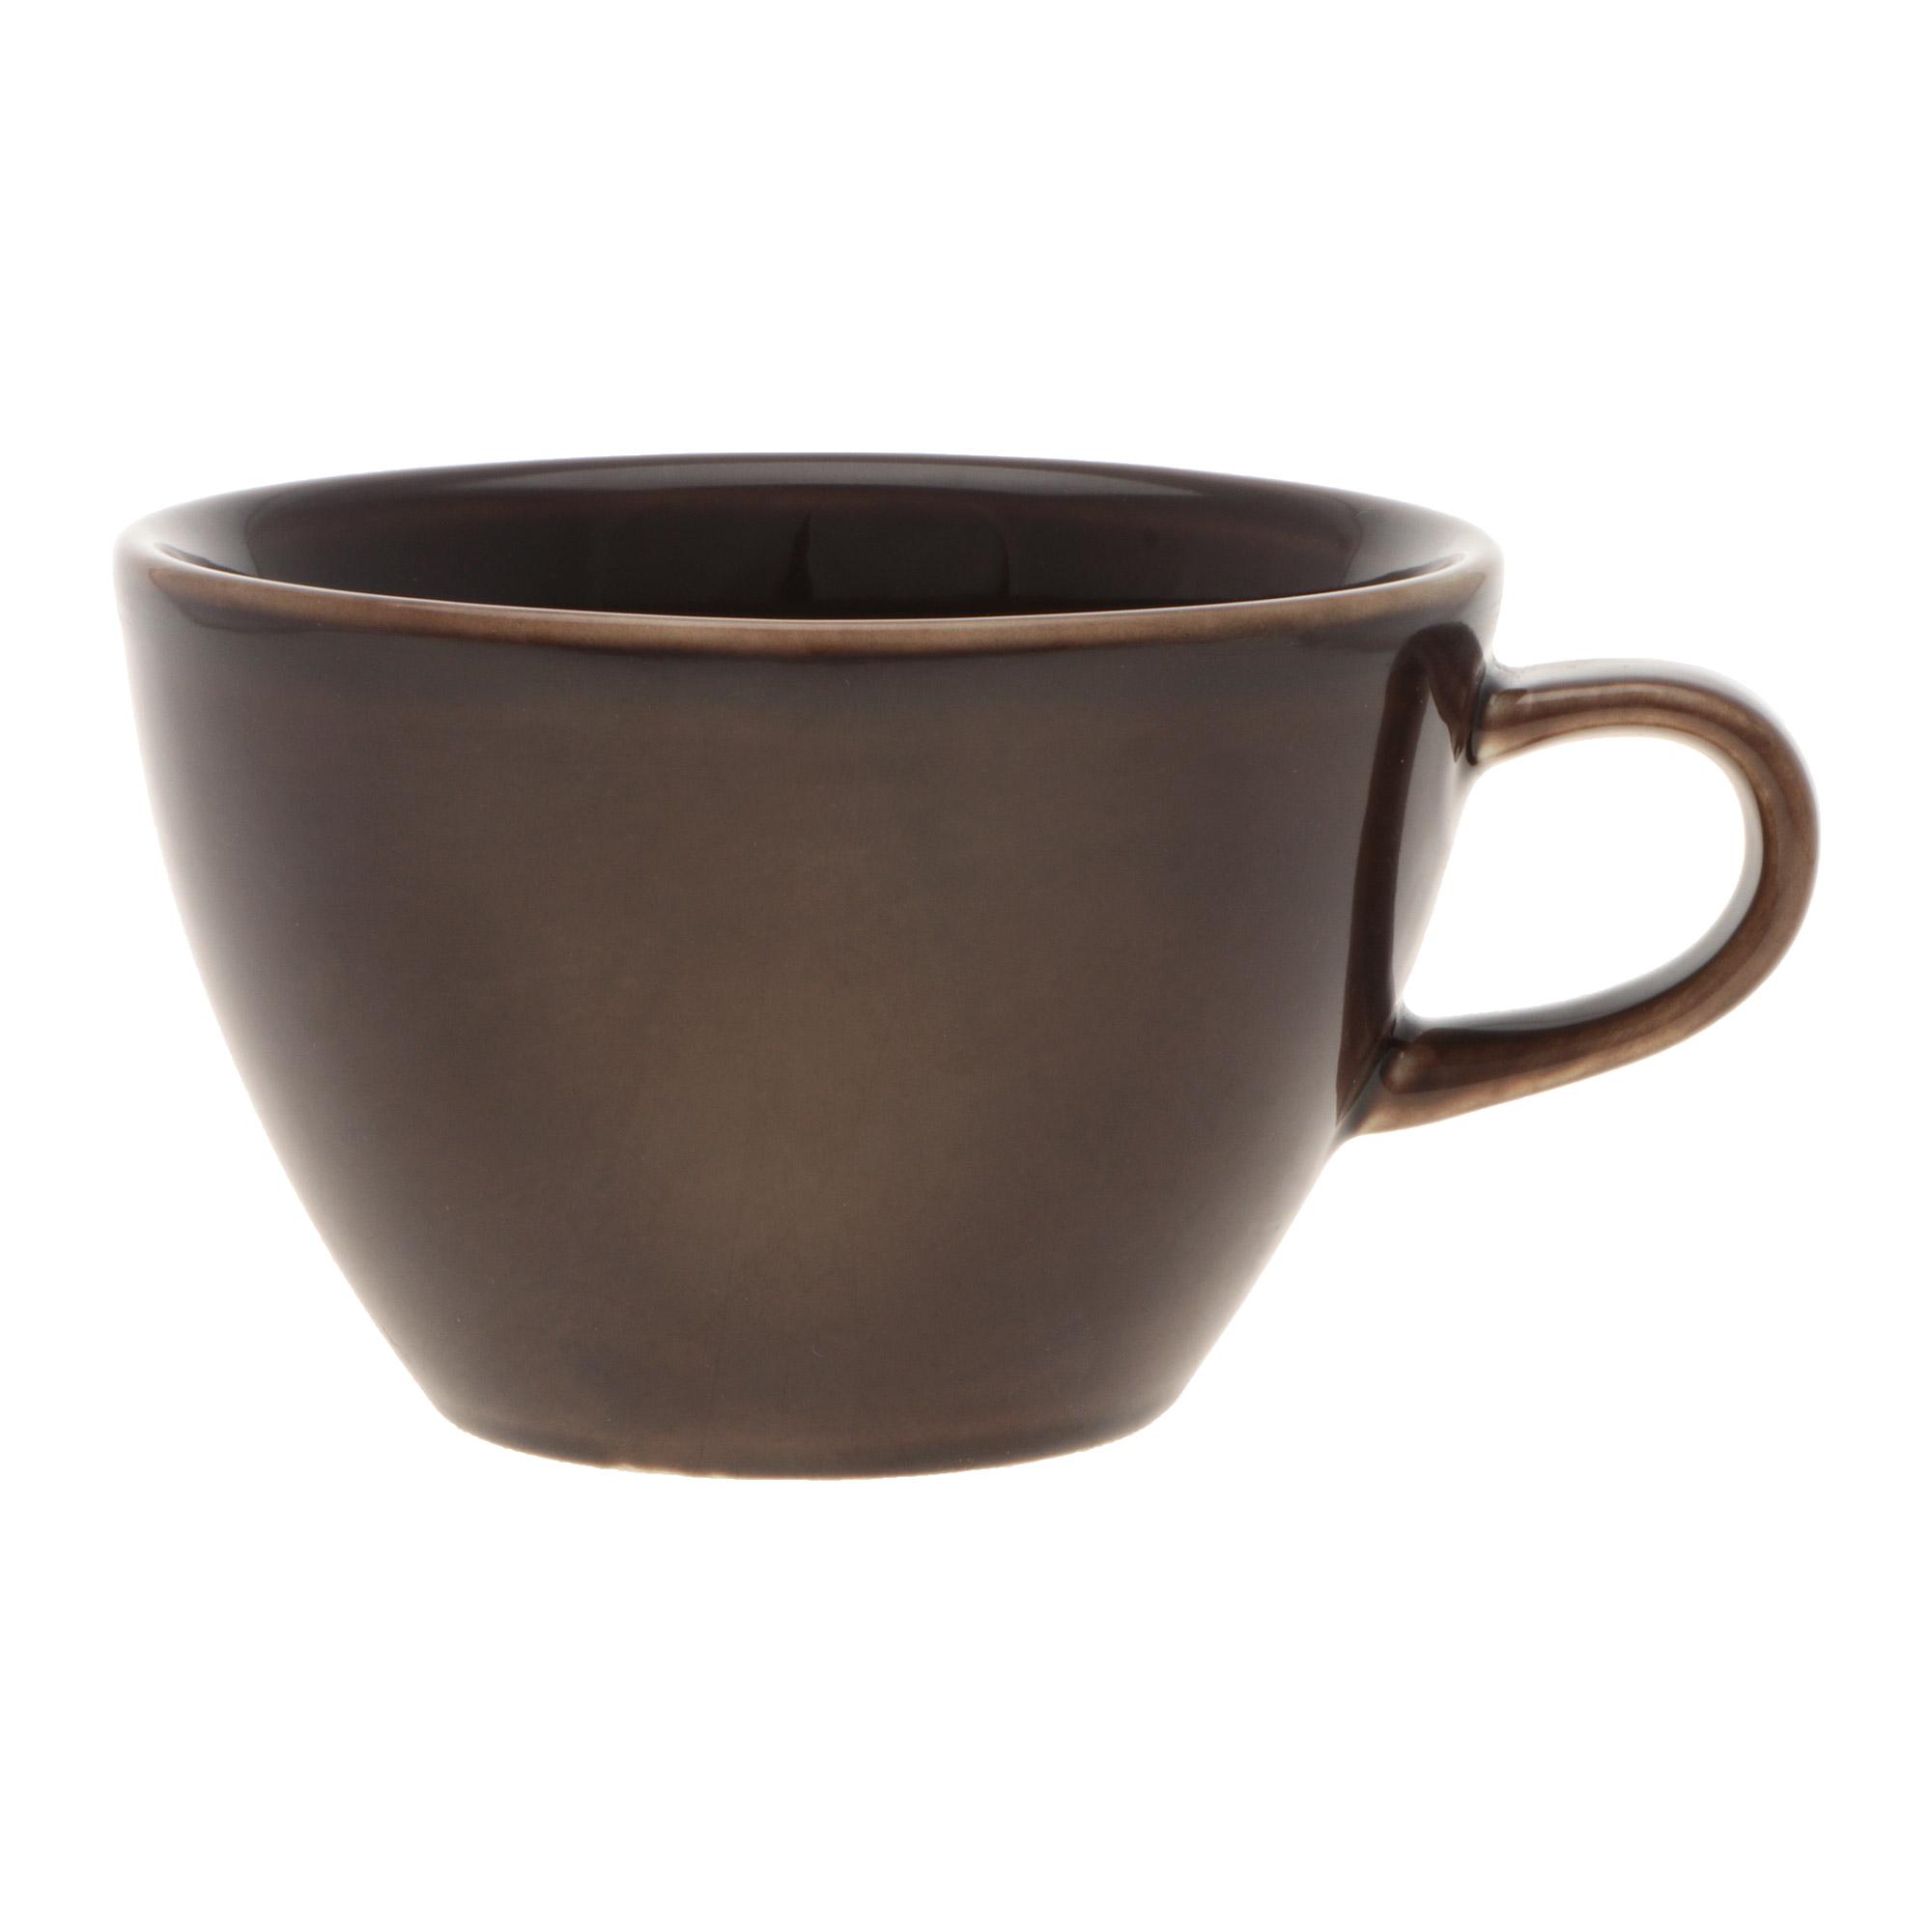 Чашка кофейная Башкирский фарфор Профи 320 мл коричневый